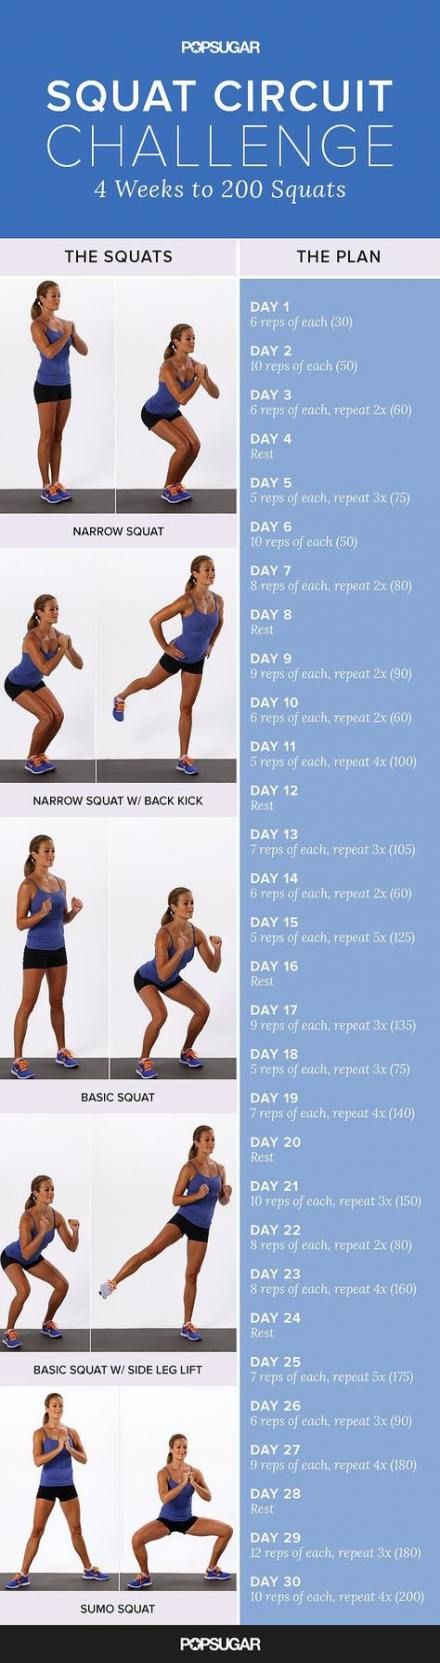 Fitness Motivation Photo 30 Day 21+ Ideas #motivation #fitness